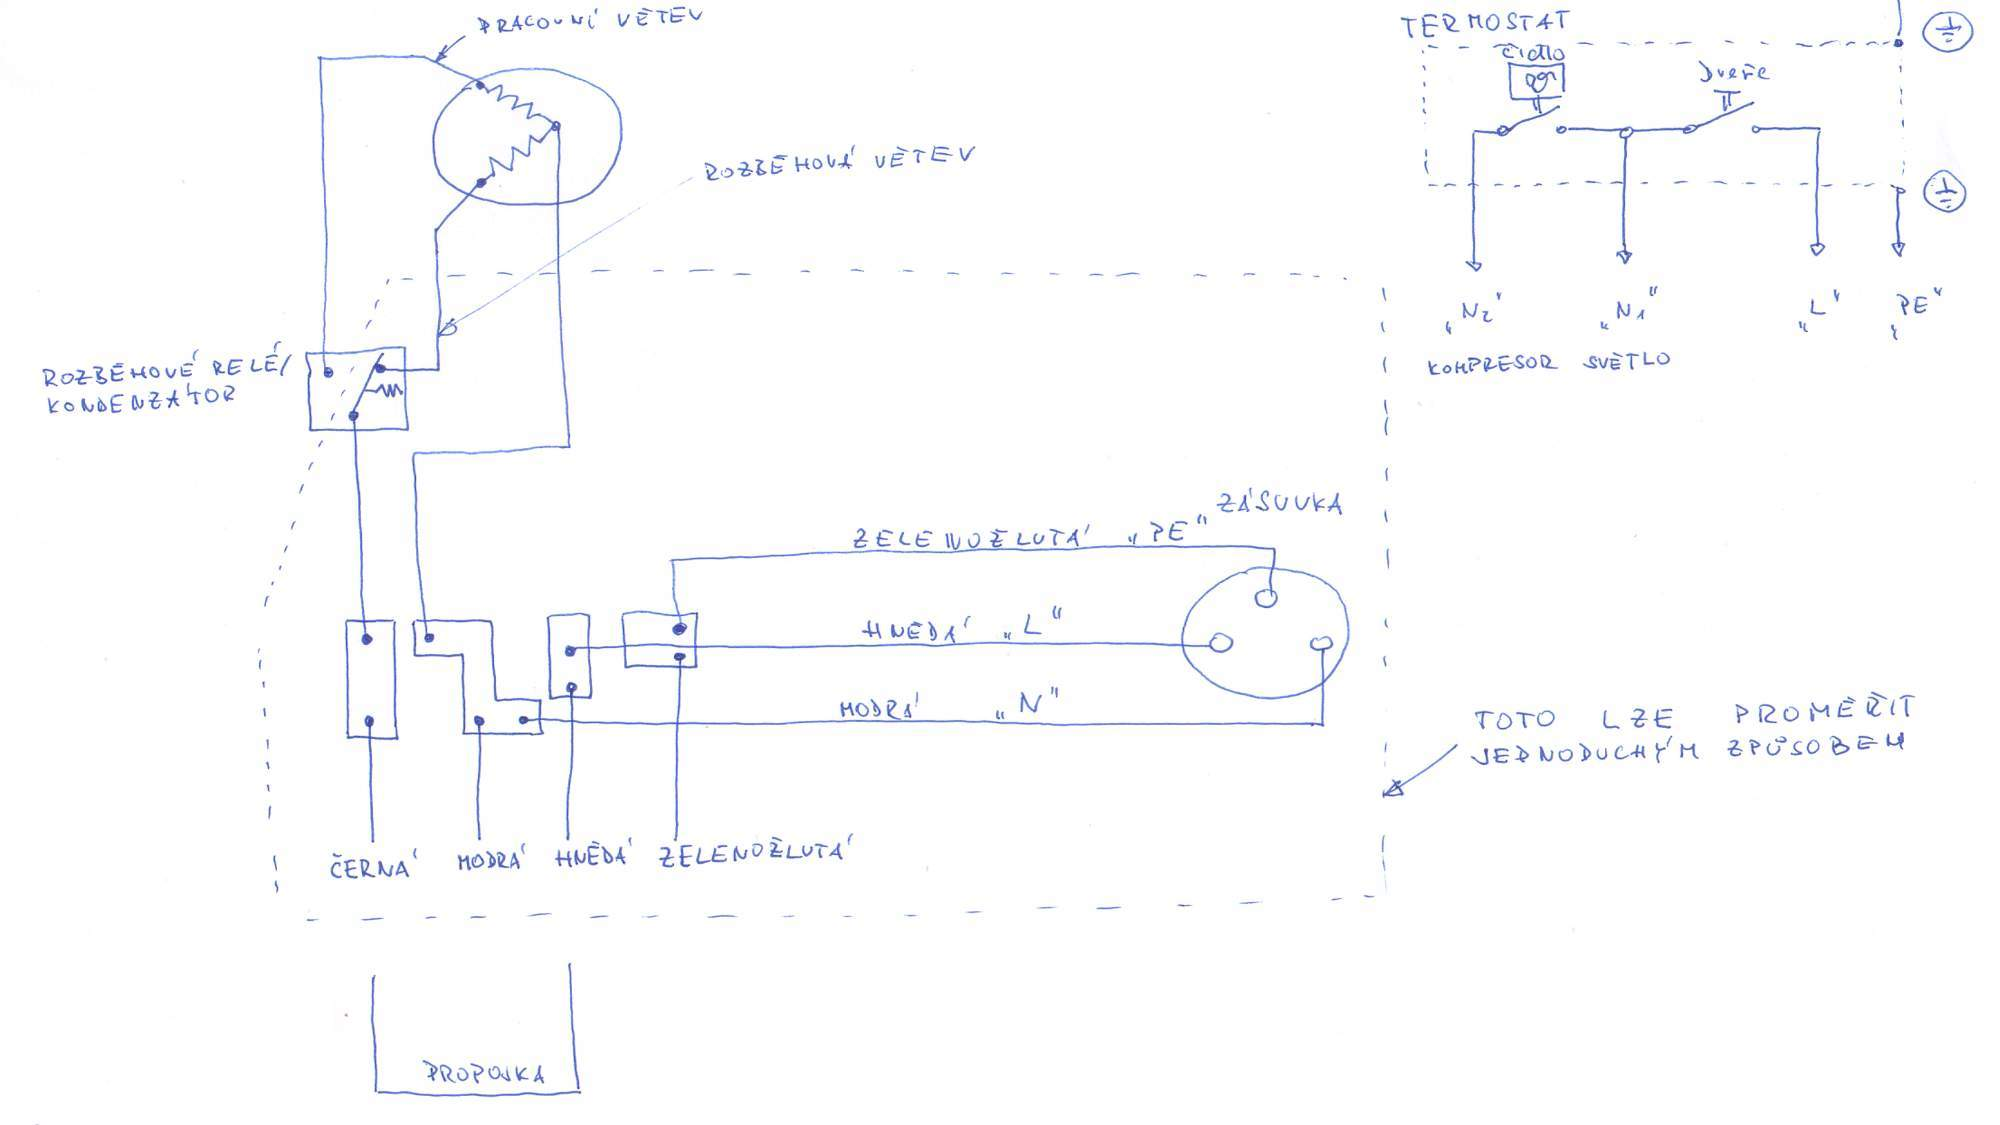 Návody - Ledničkový kompresor V3 a V4 – inc-models